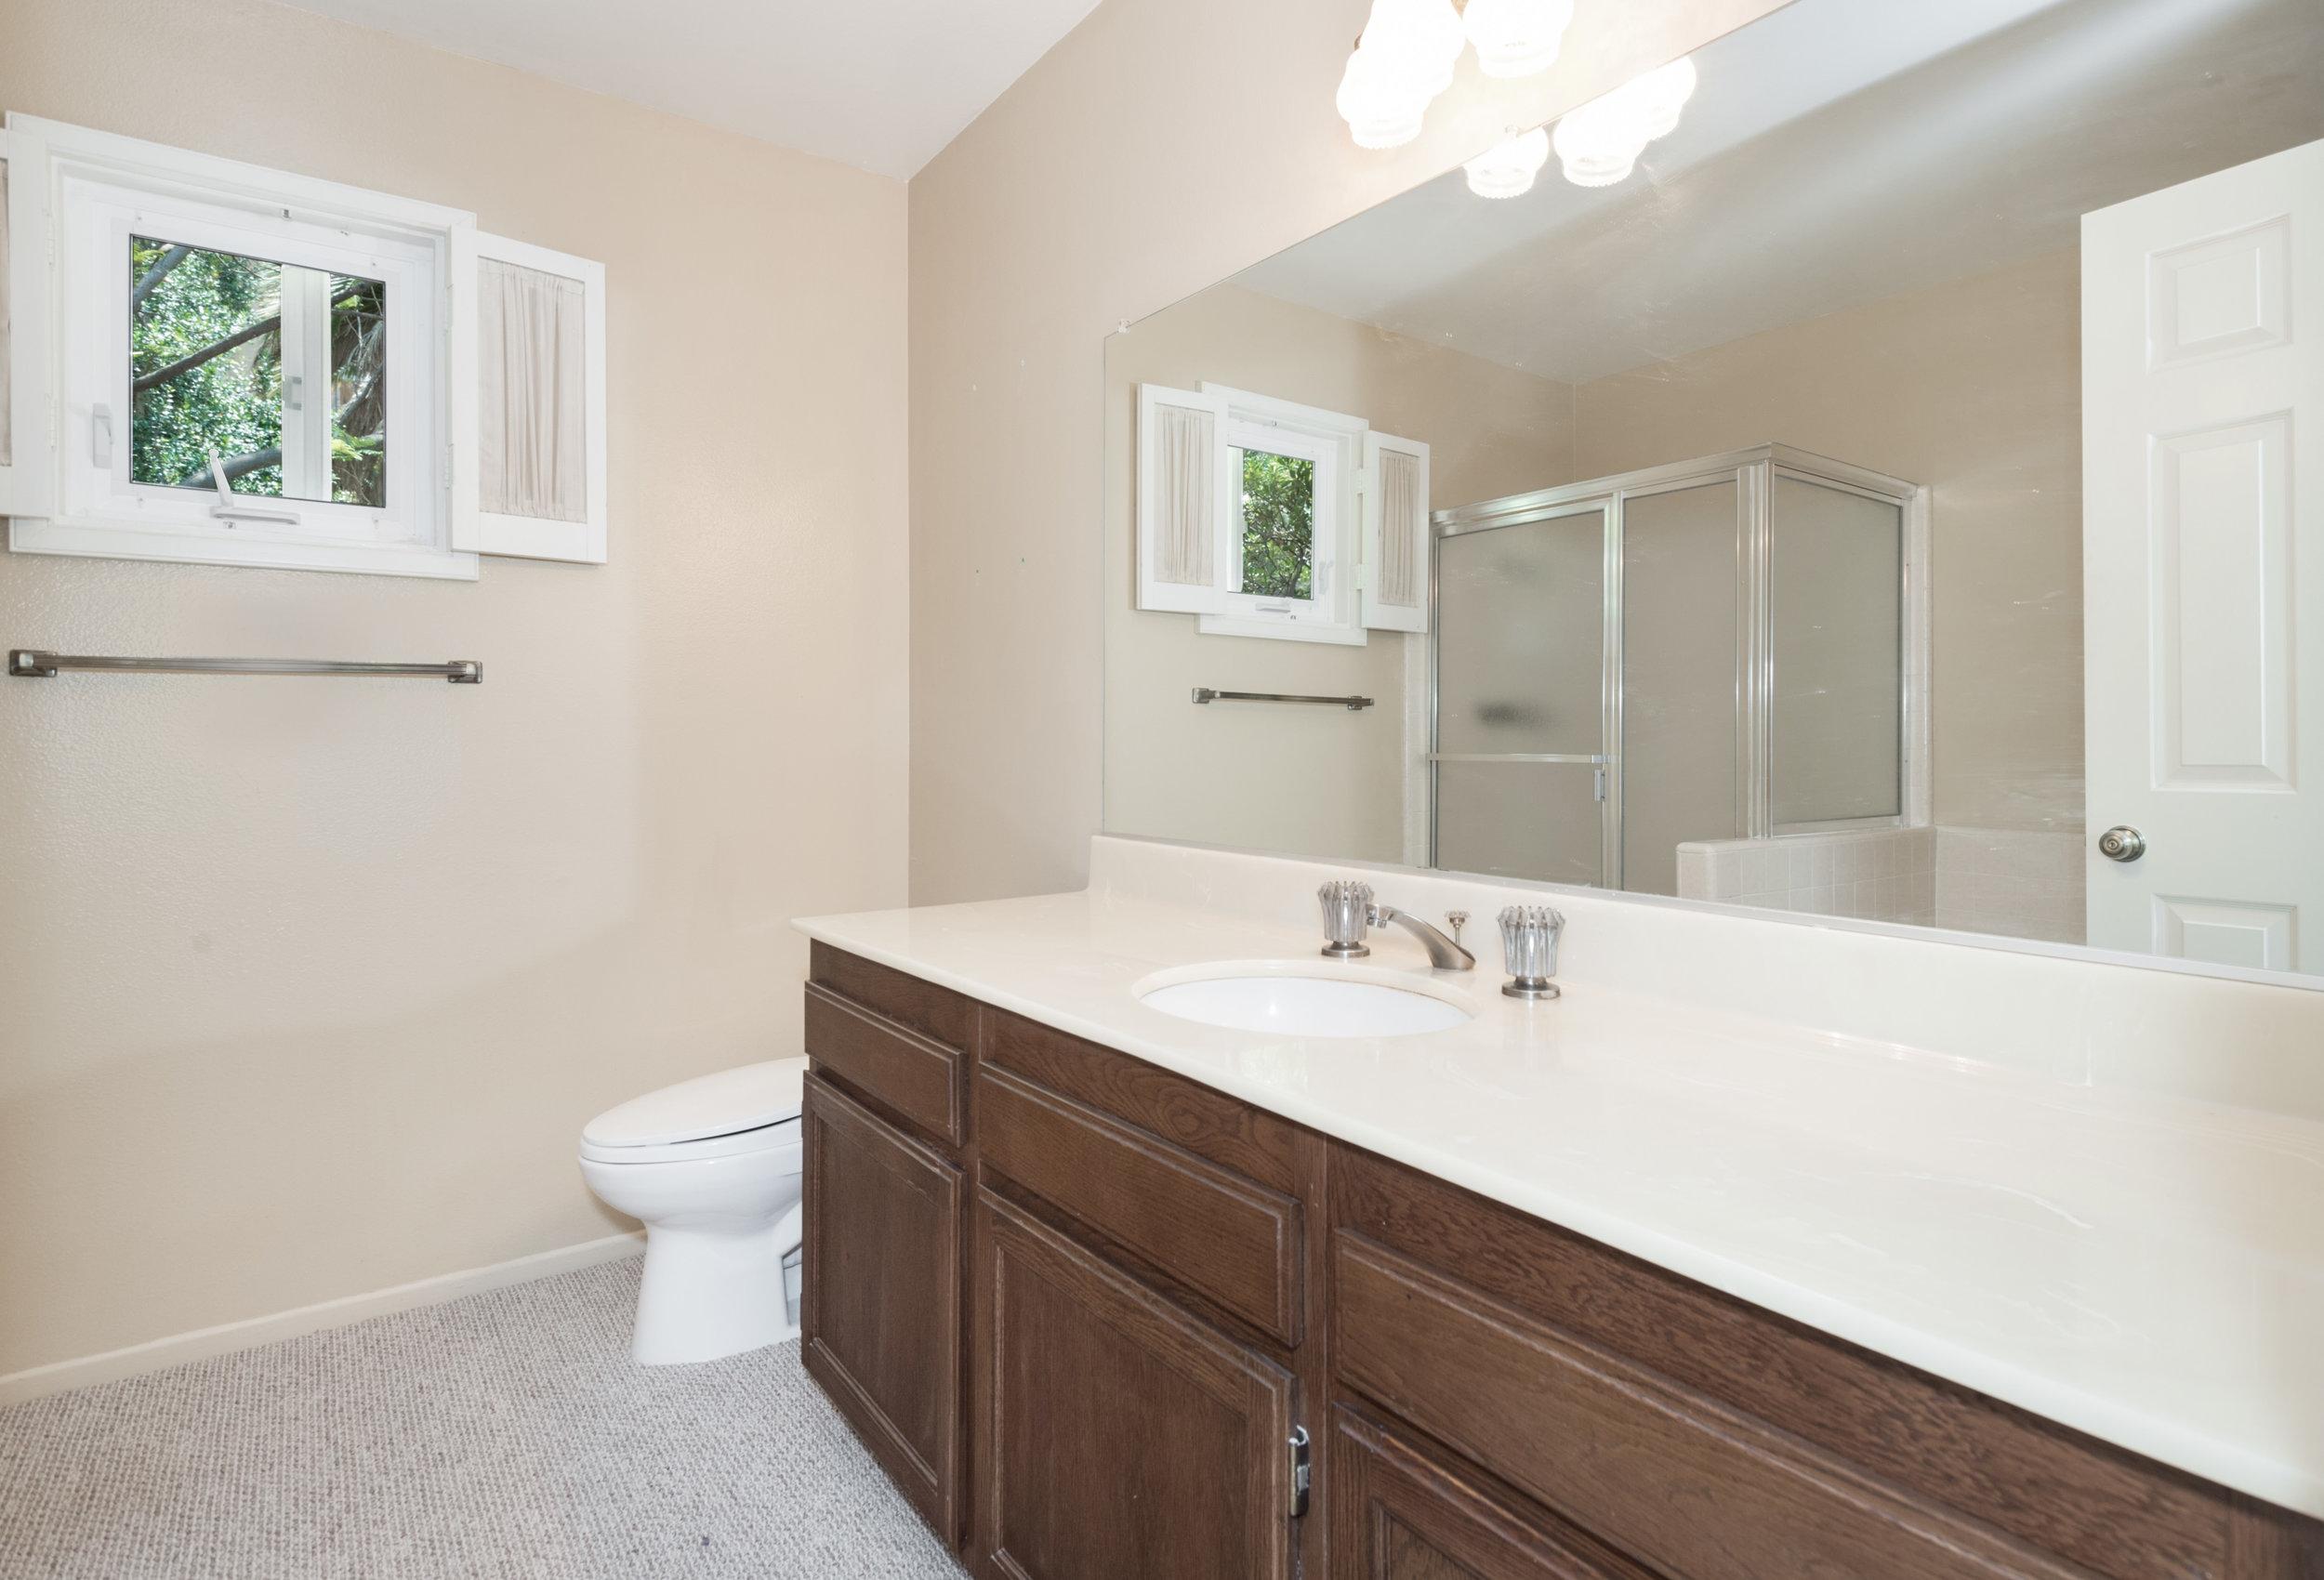 013 bathroom 8832 Moorcroft Avenue West Hills For Sale Lease The Malibu Life Team Luxury Real Estate.jpg